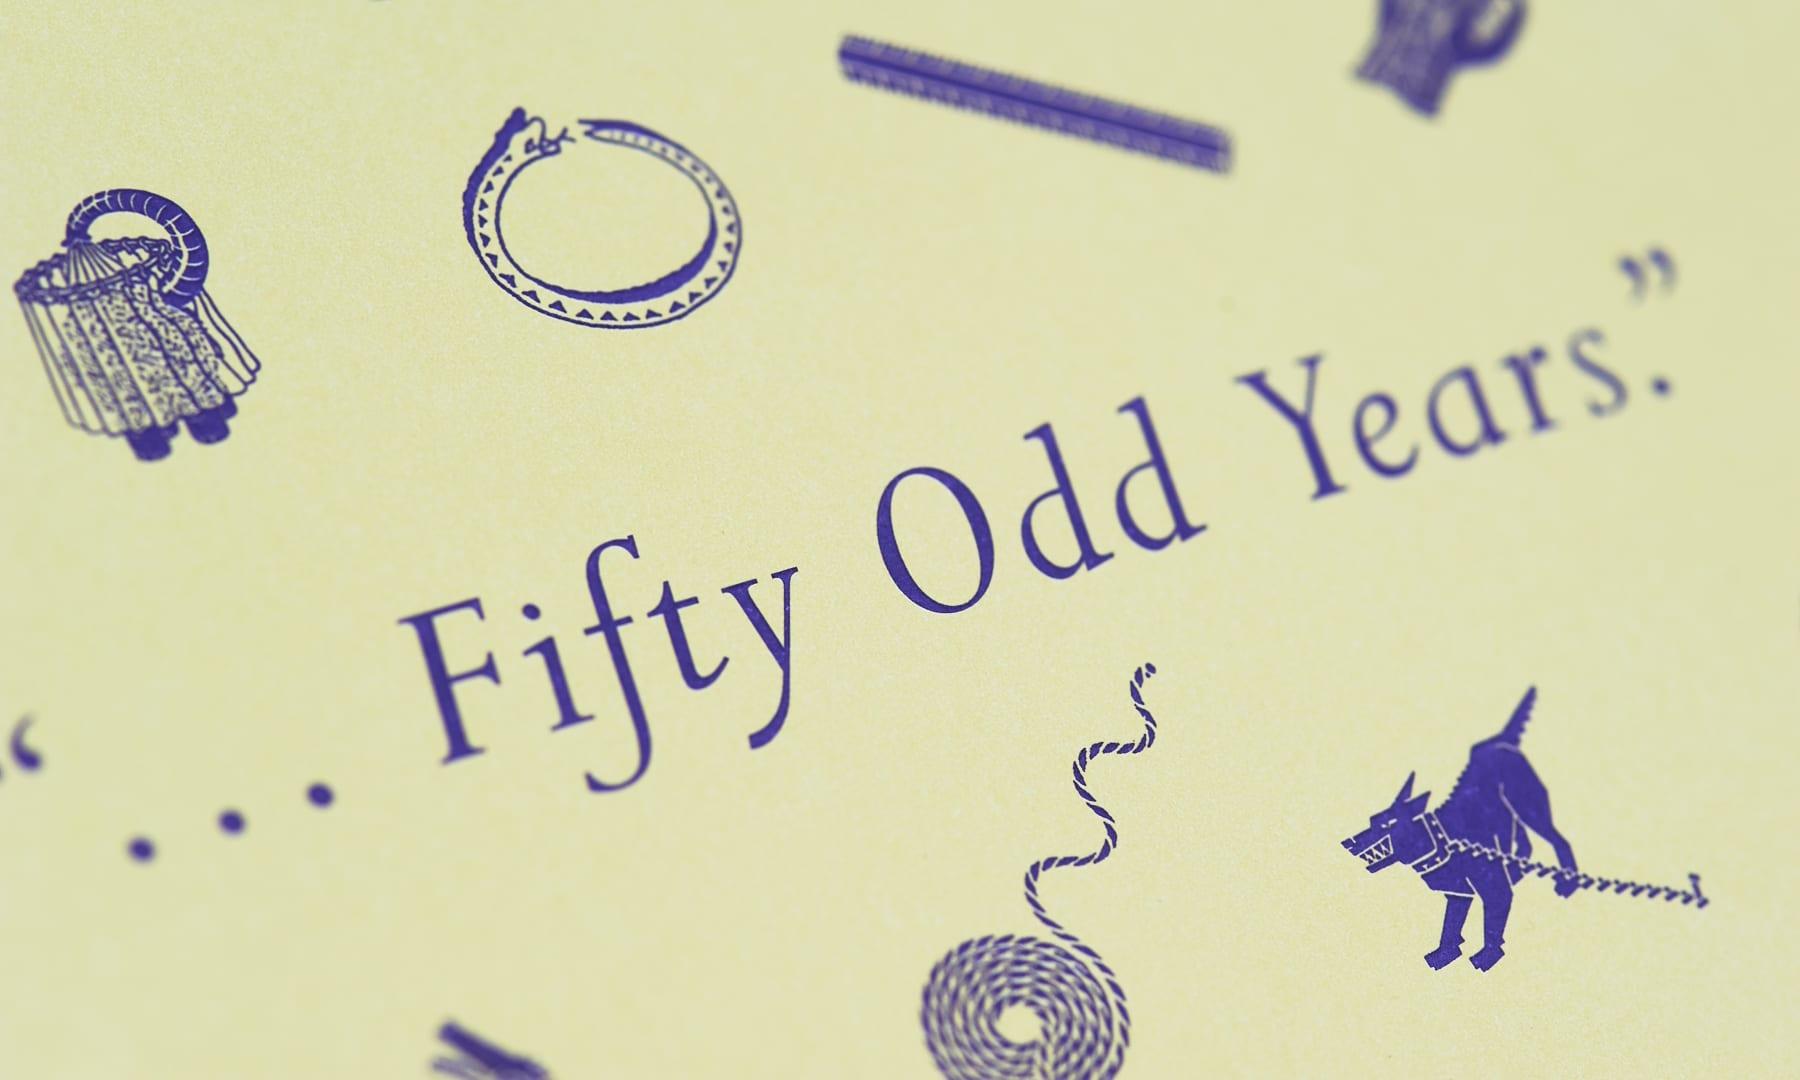 Fifty Odd Years - George Hardie - closeup